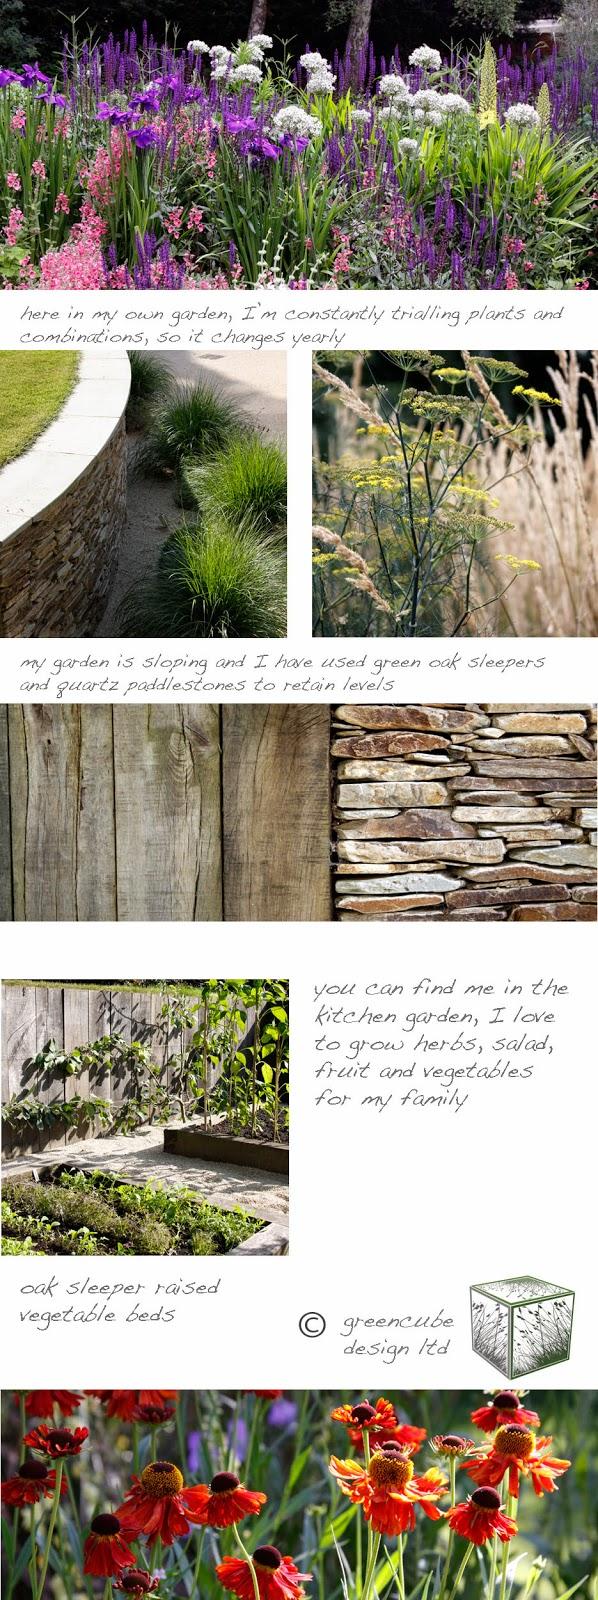 Greencube garden and landscape design uk great news for for Great gardens landscape design